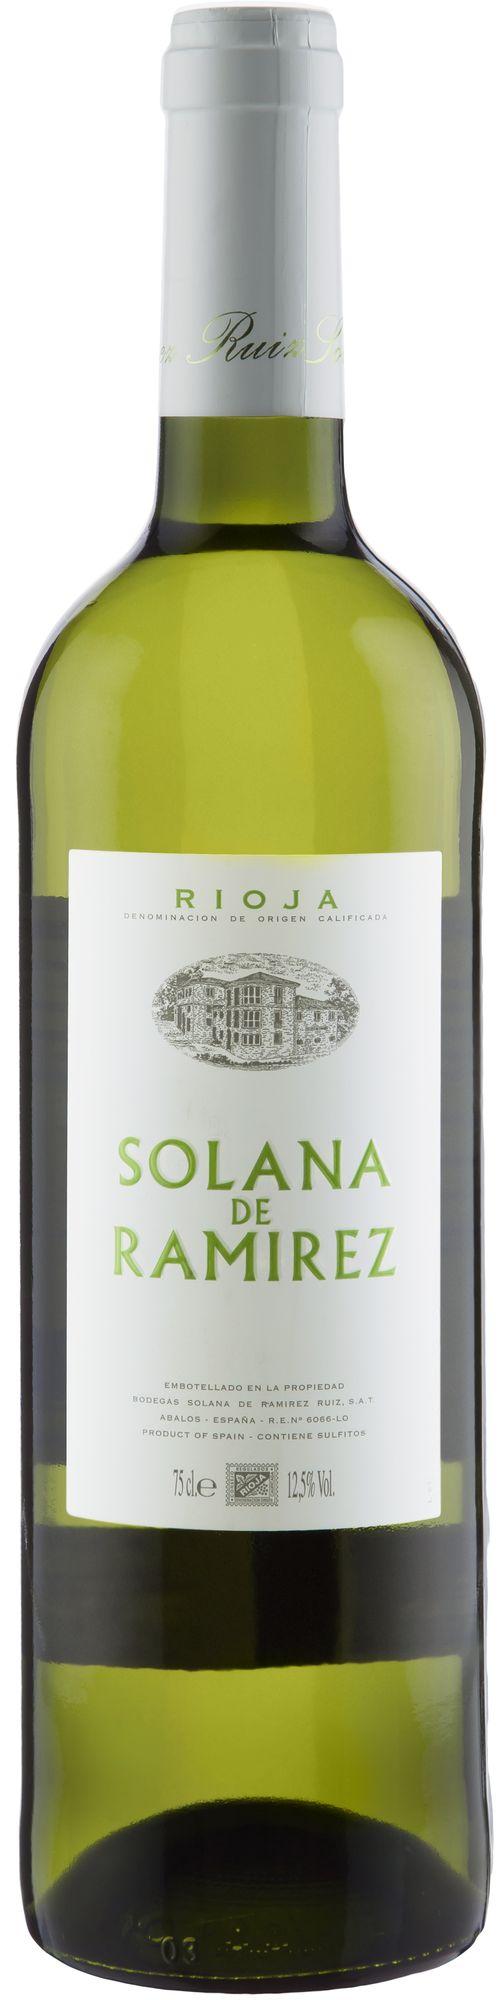 Wino Solana Ramirez Blanco Joven Rioja DOCa